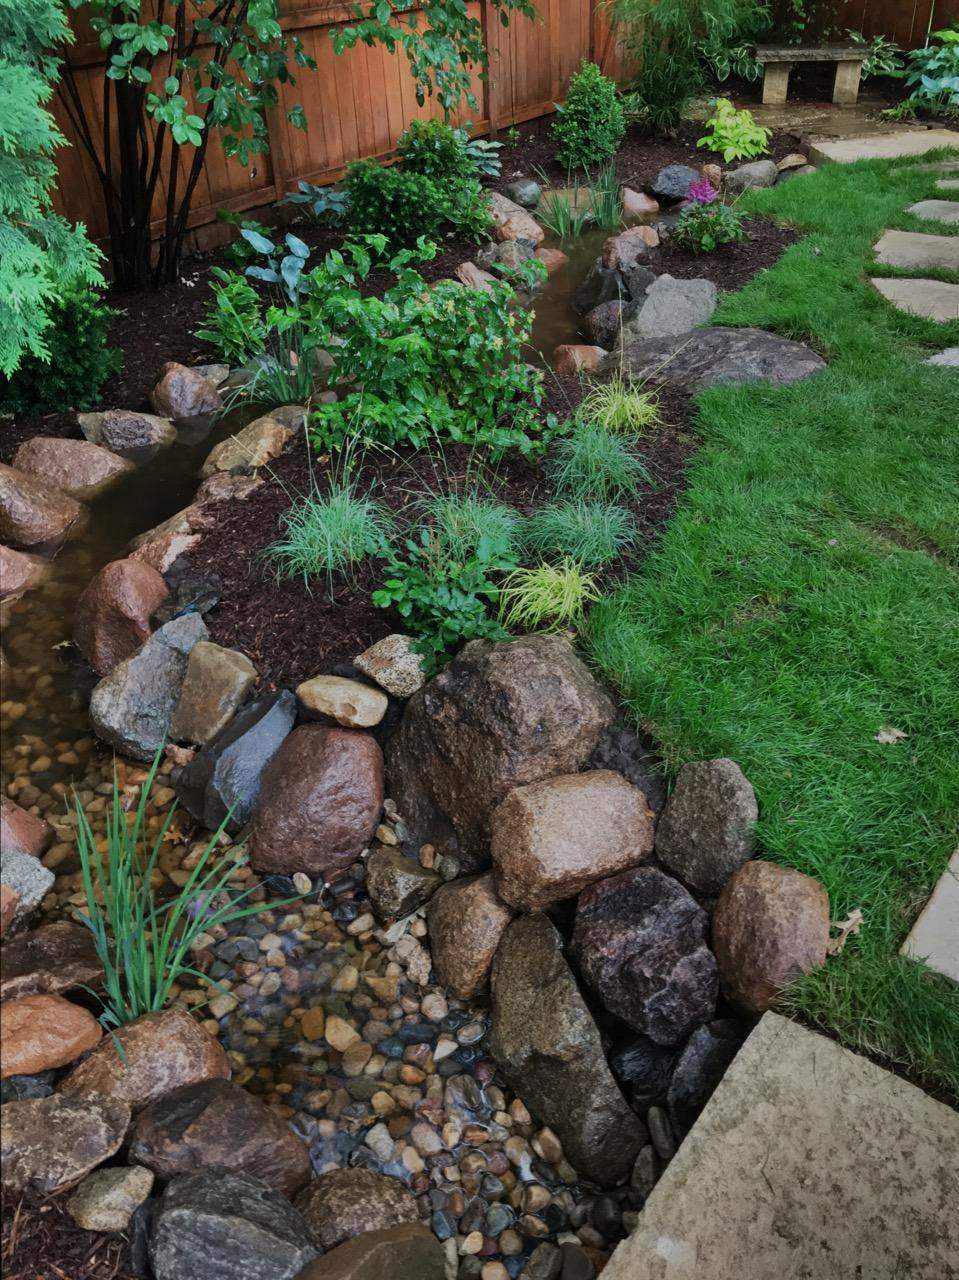 Sedges, Astilbe, Diervilla, Siberian Iris